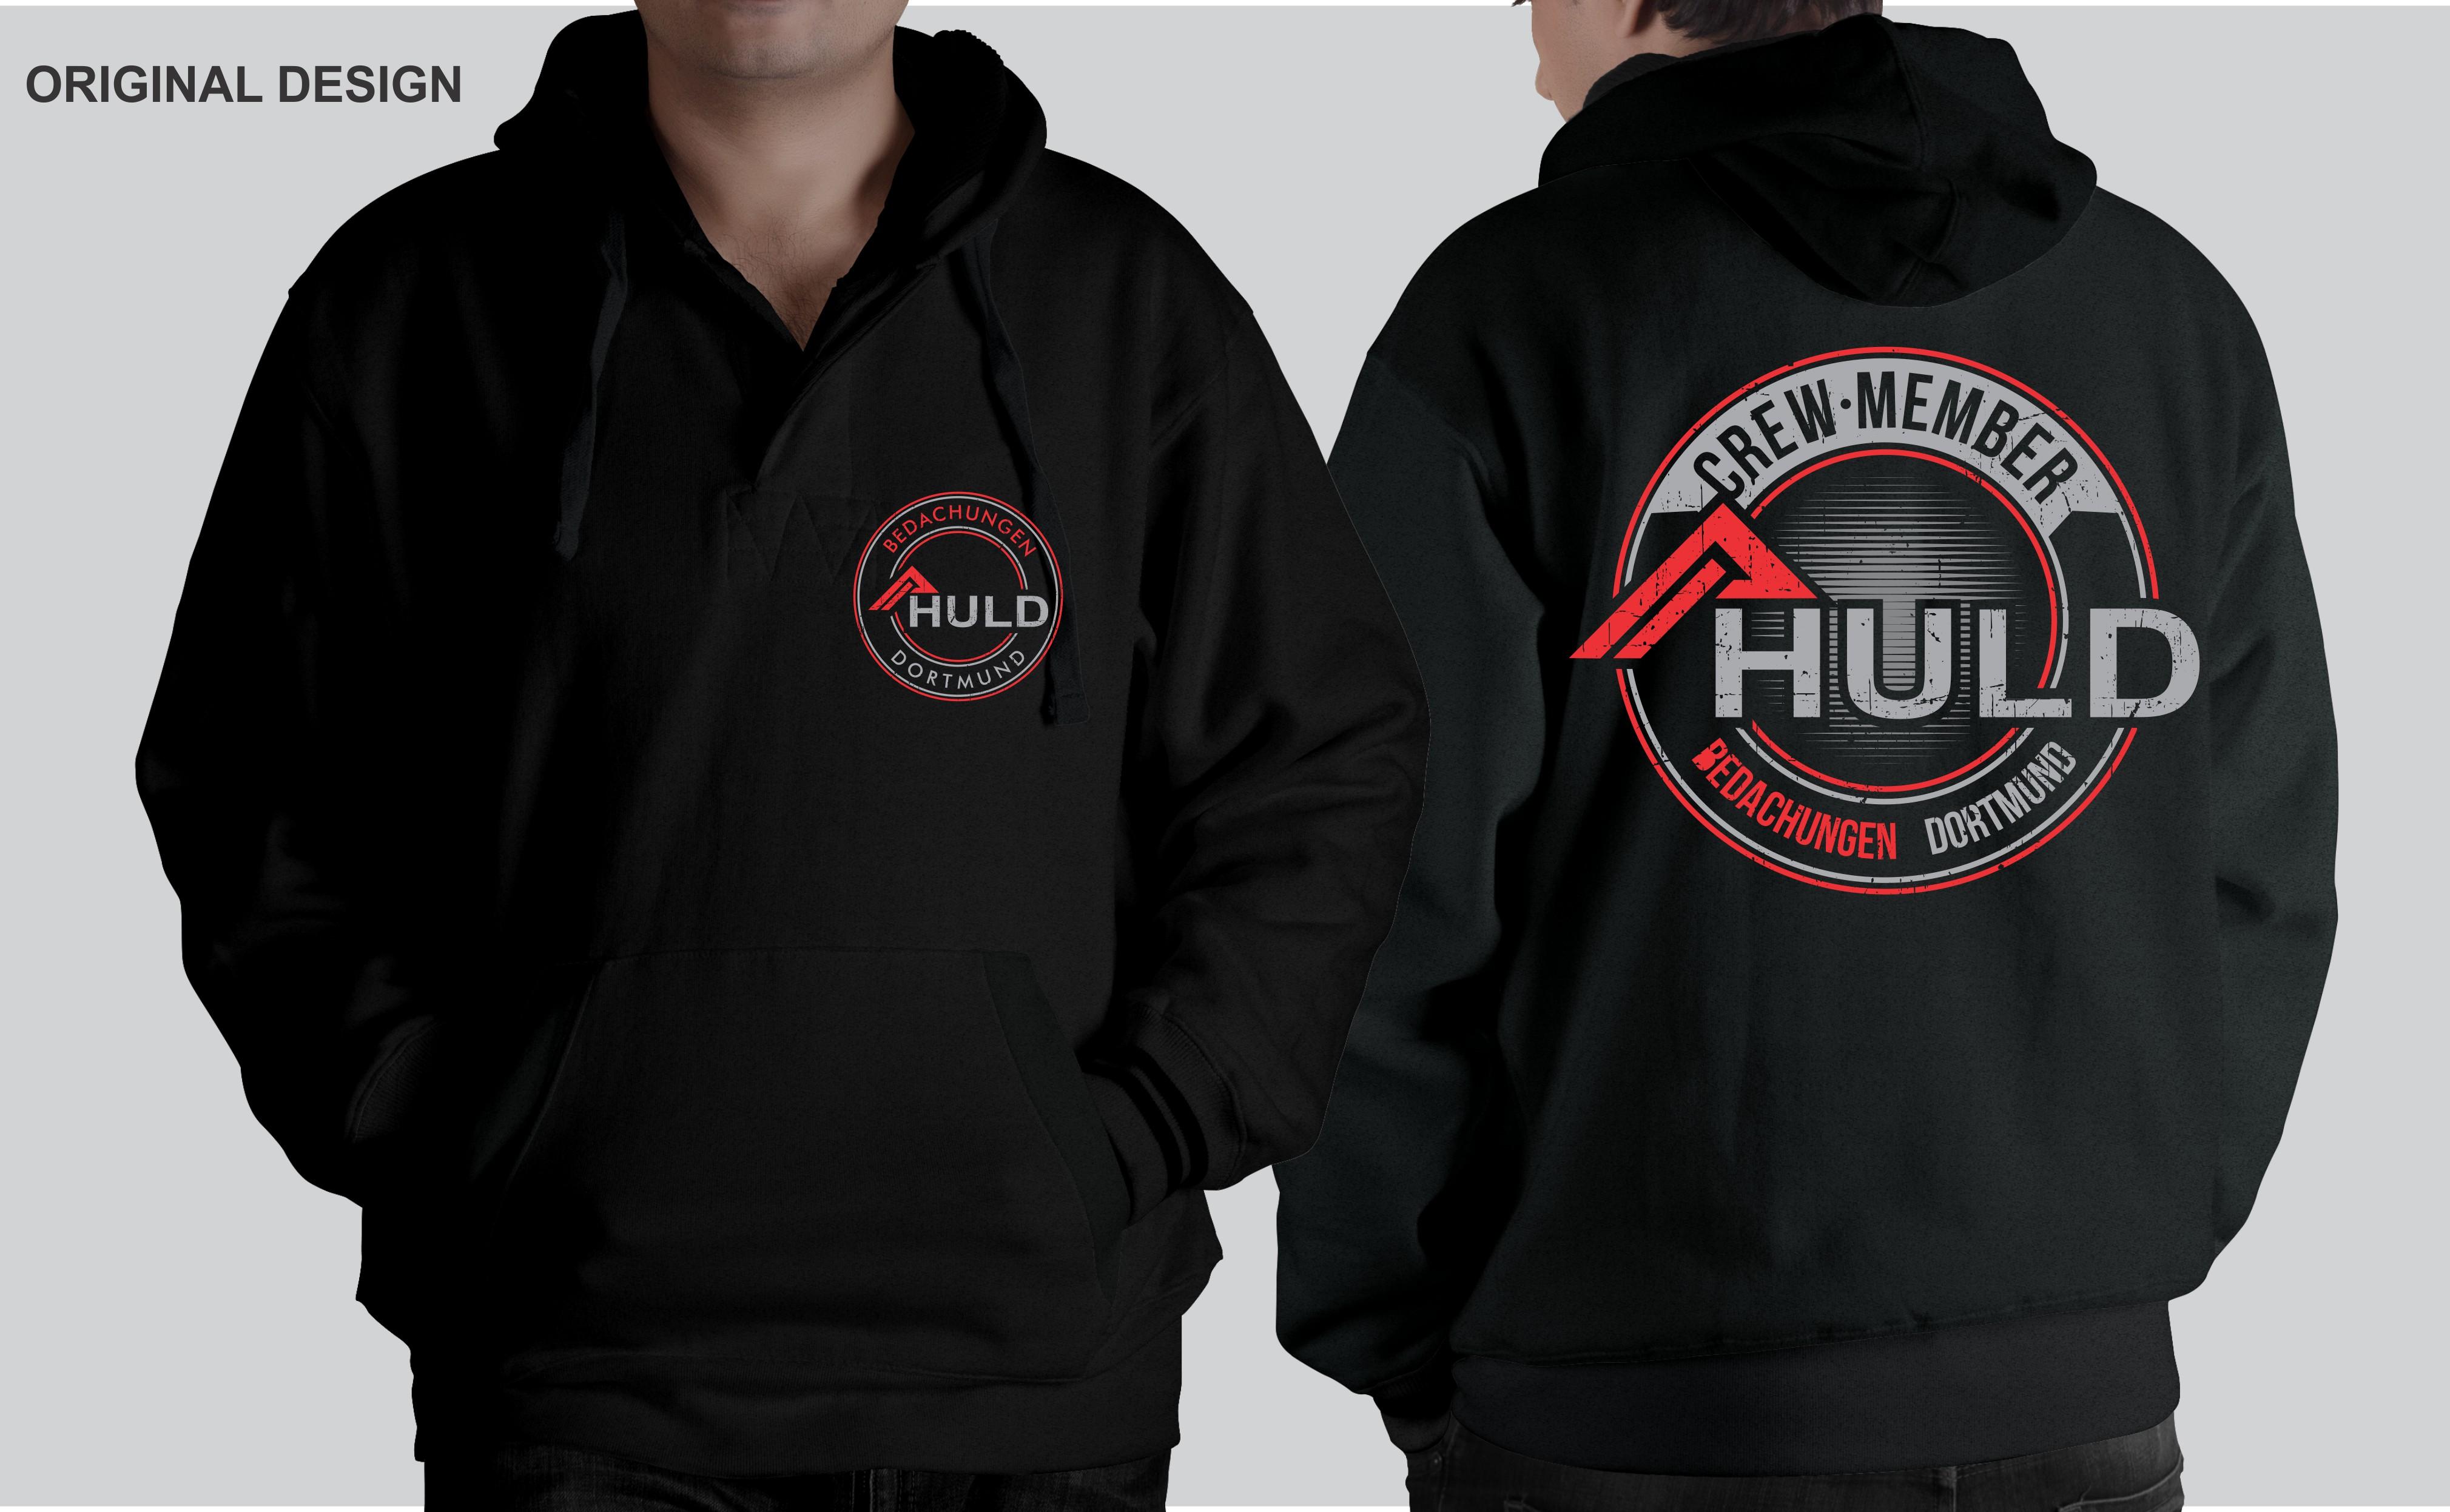 Bekleidung Design mit Logo